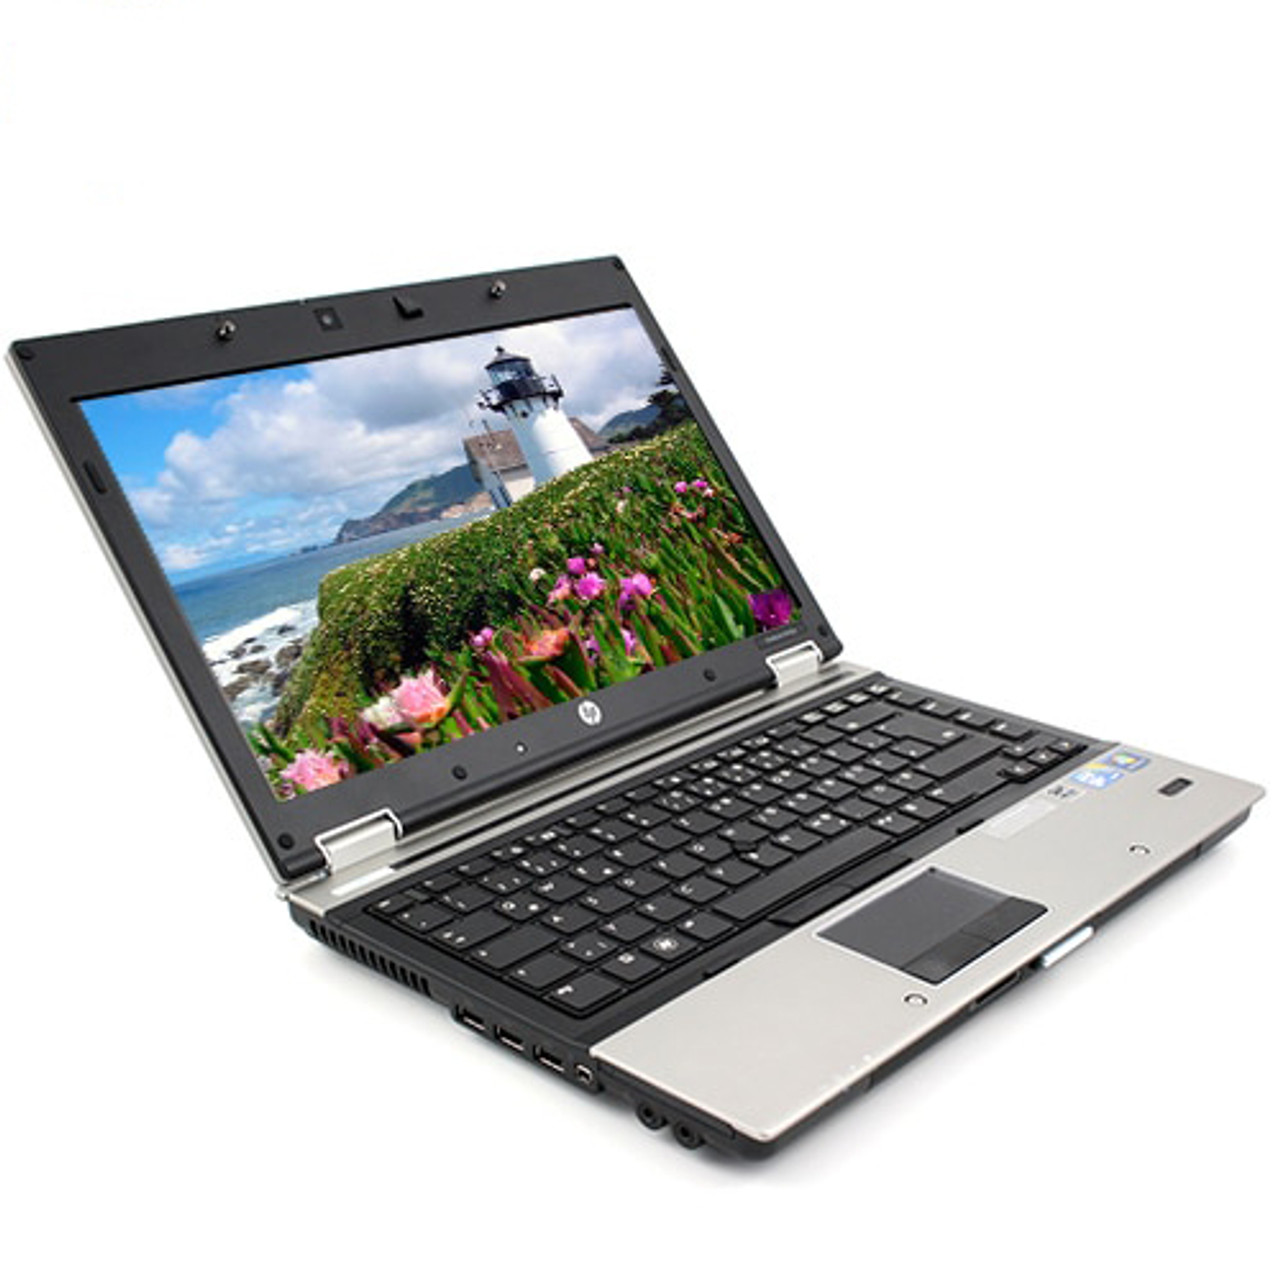 HP Laptop EliteBook Series Windows 10 i5-1st Gen 4GB RAM DVD WIFI Computer  PC